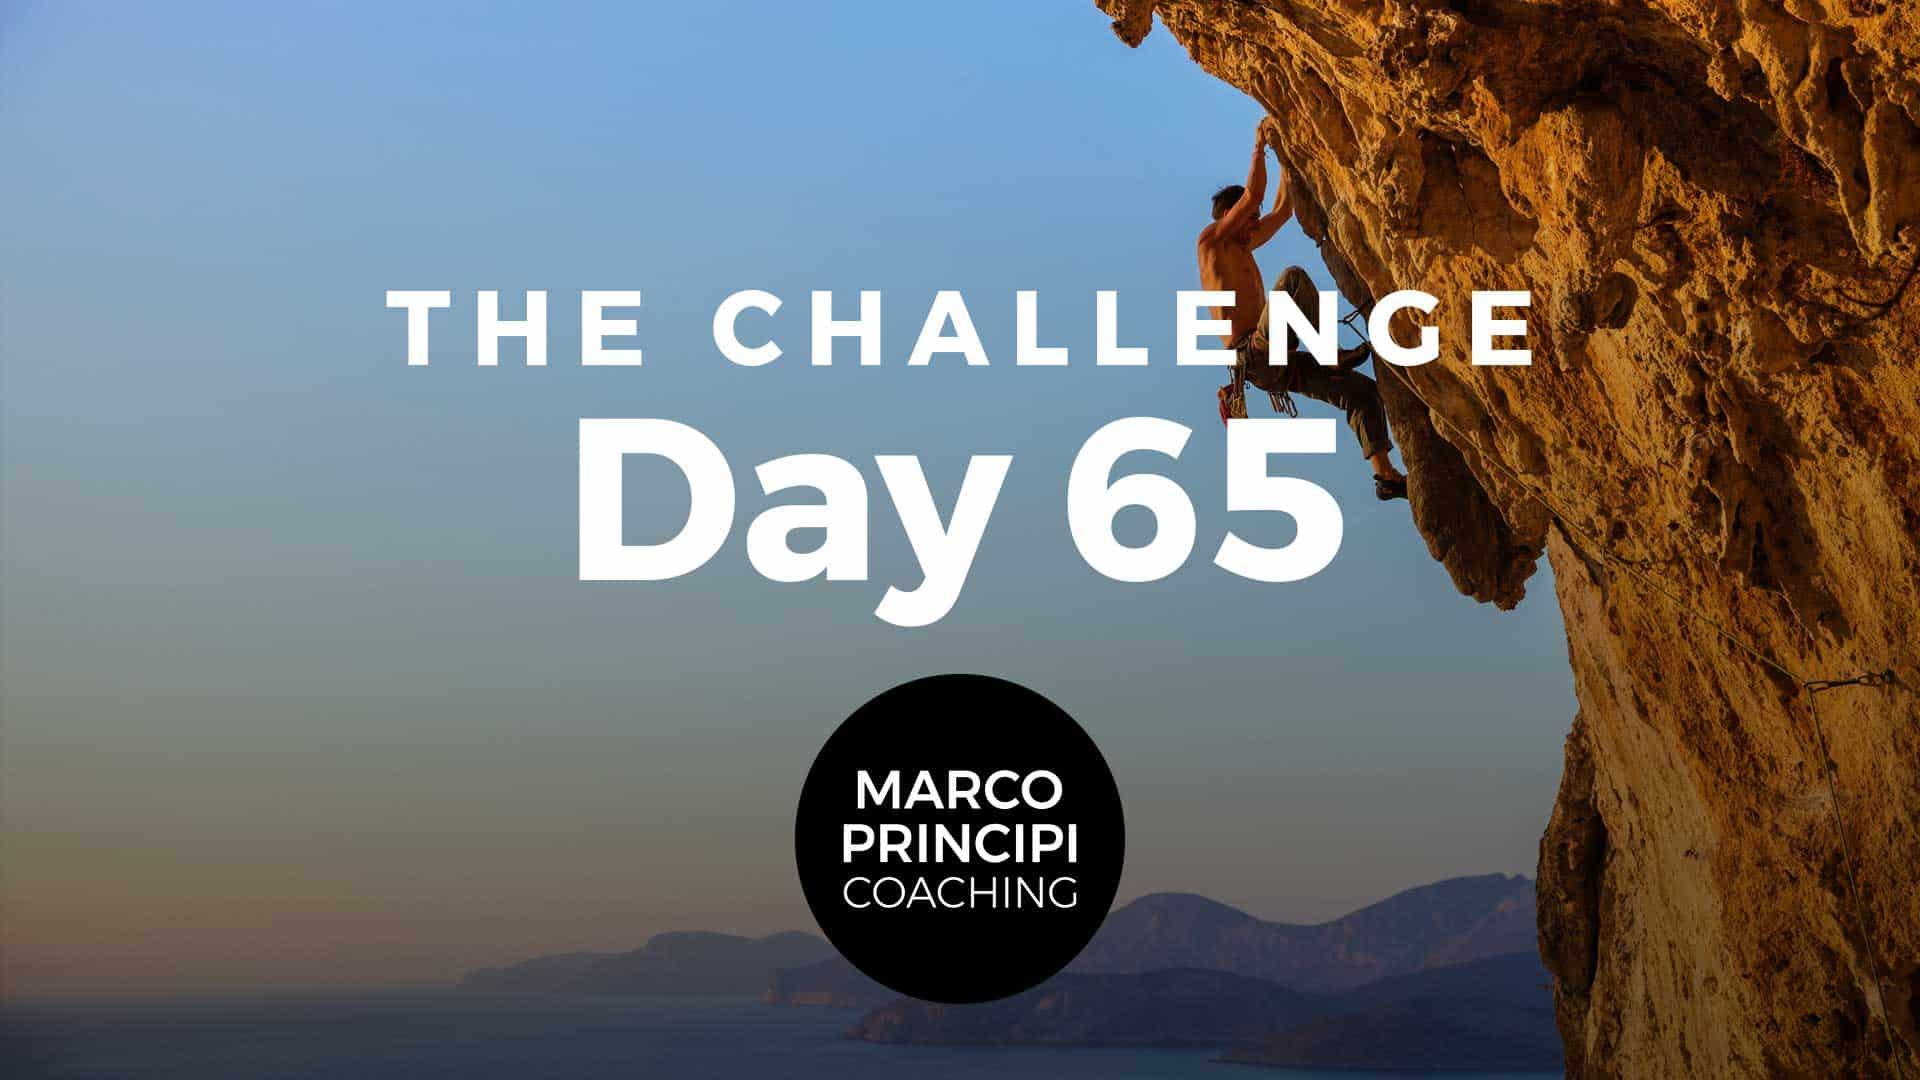 Marco Principi Coaching Challenge Day 65